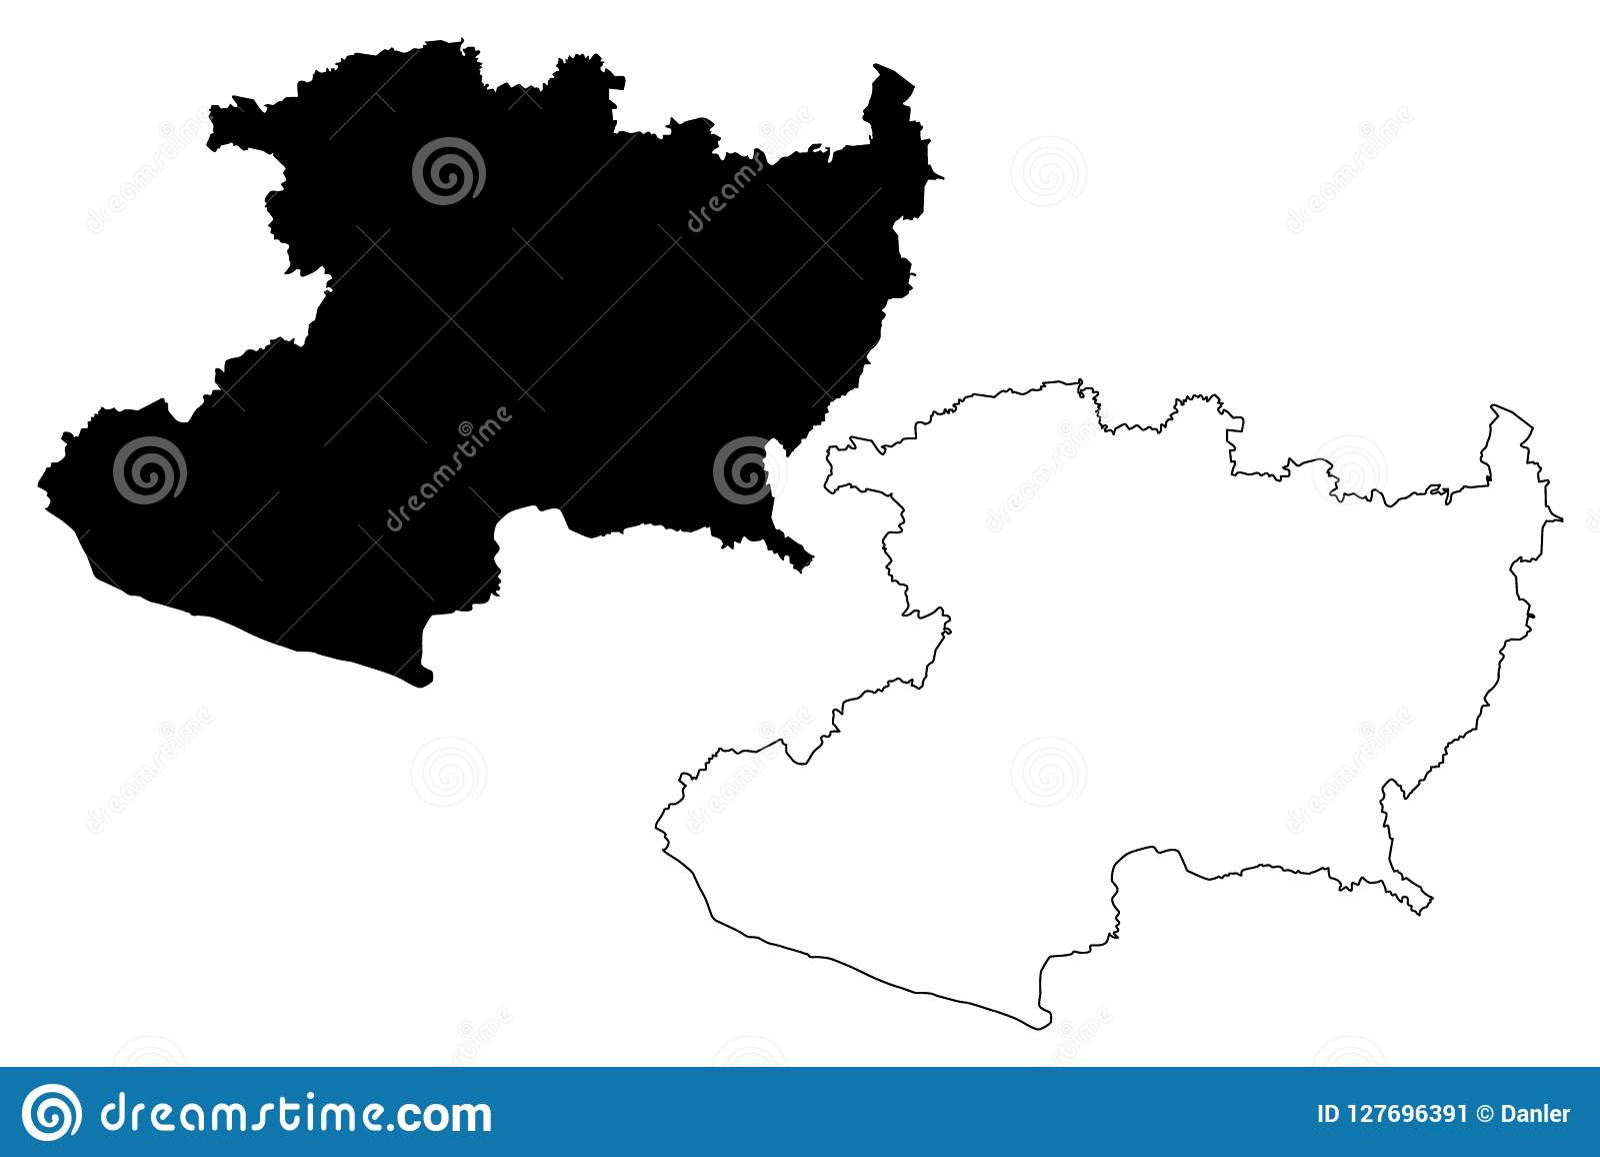 Michoacan map vector stock vector. Illustration of icon - 127696391